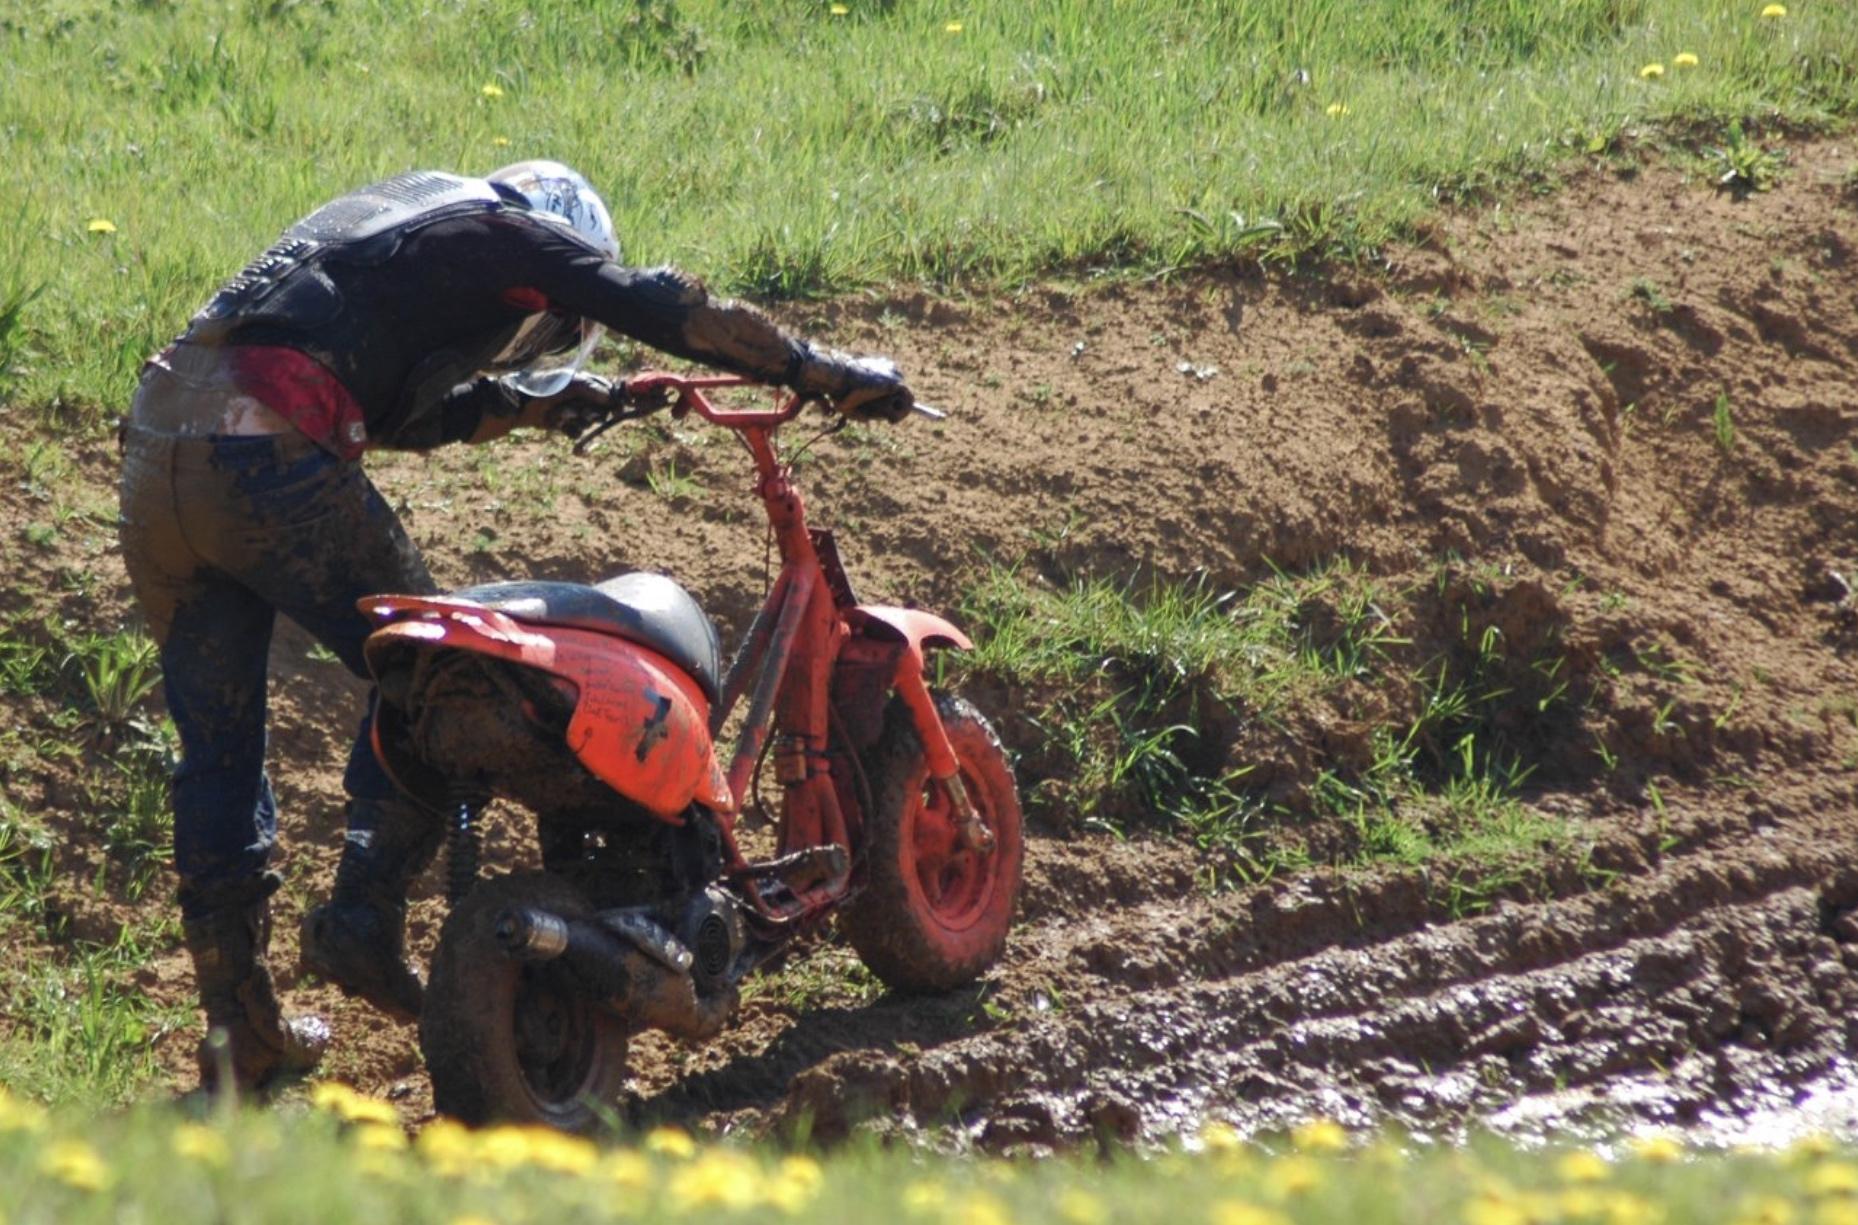 Moped Mayhem